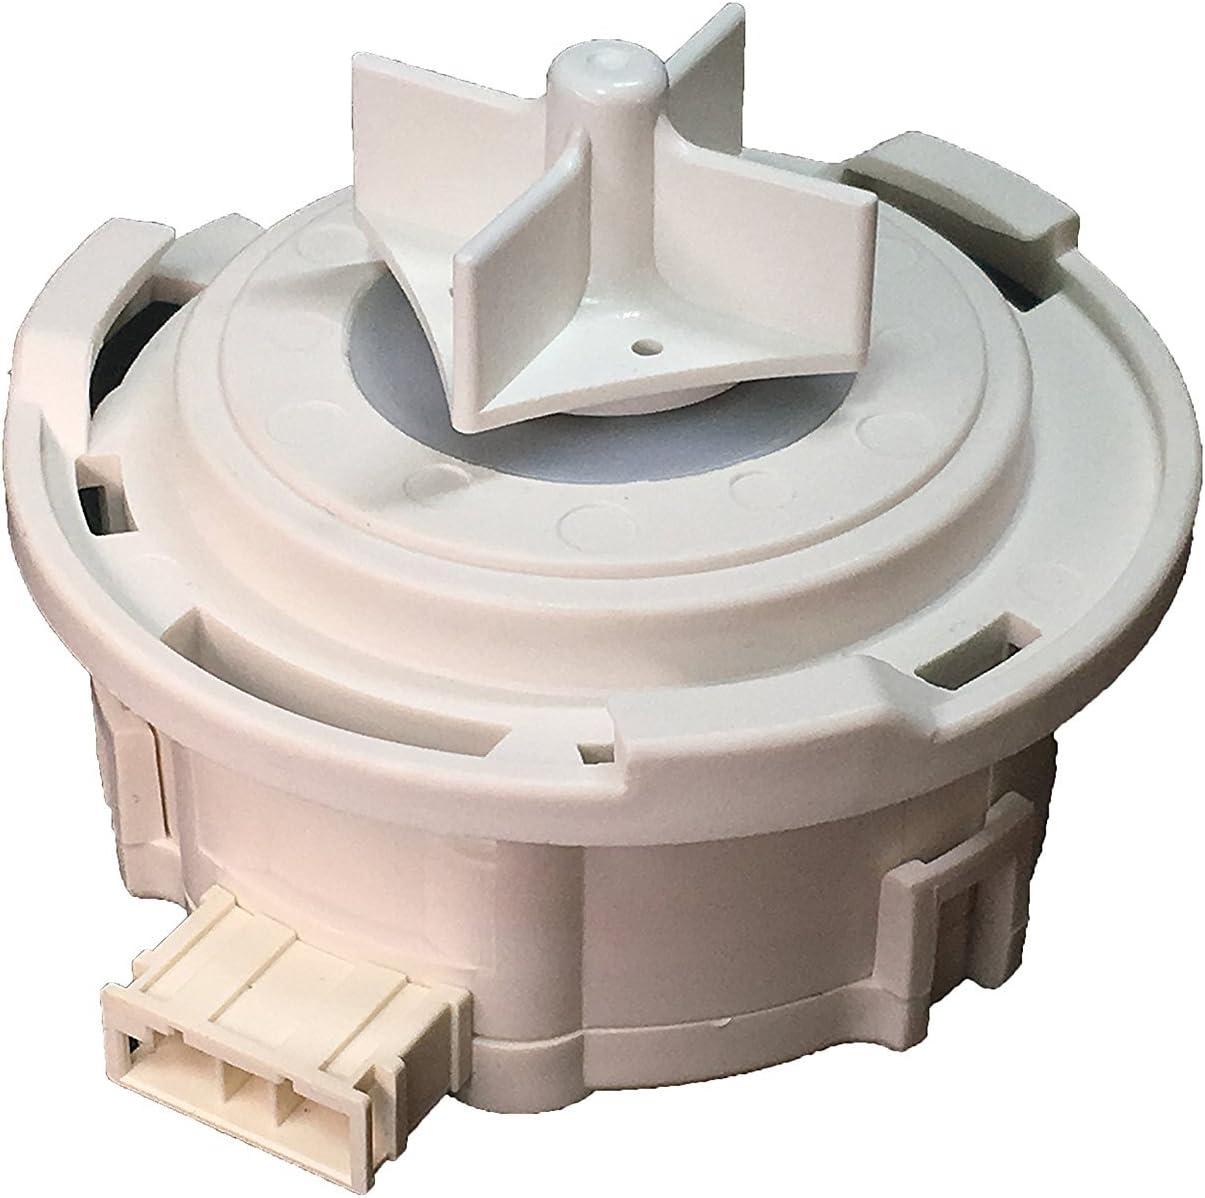 LG - Bomba desagüe lavavajillas LG (c.c.): Amazon.es: Bricolaje y ...